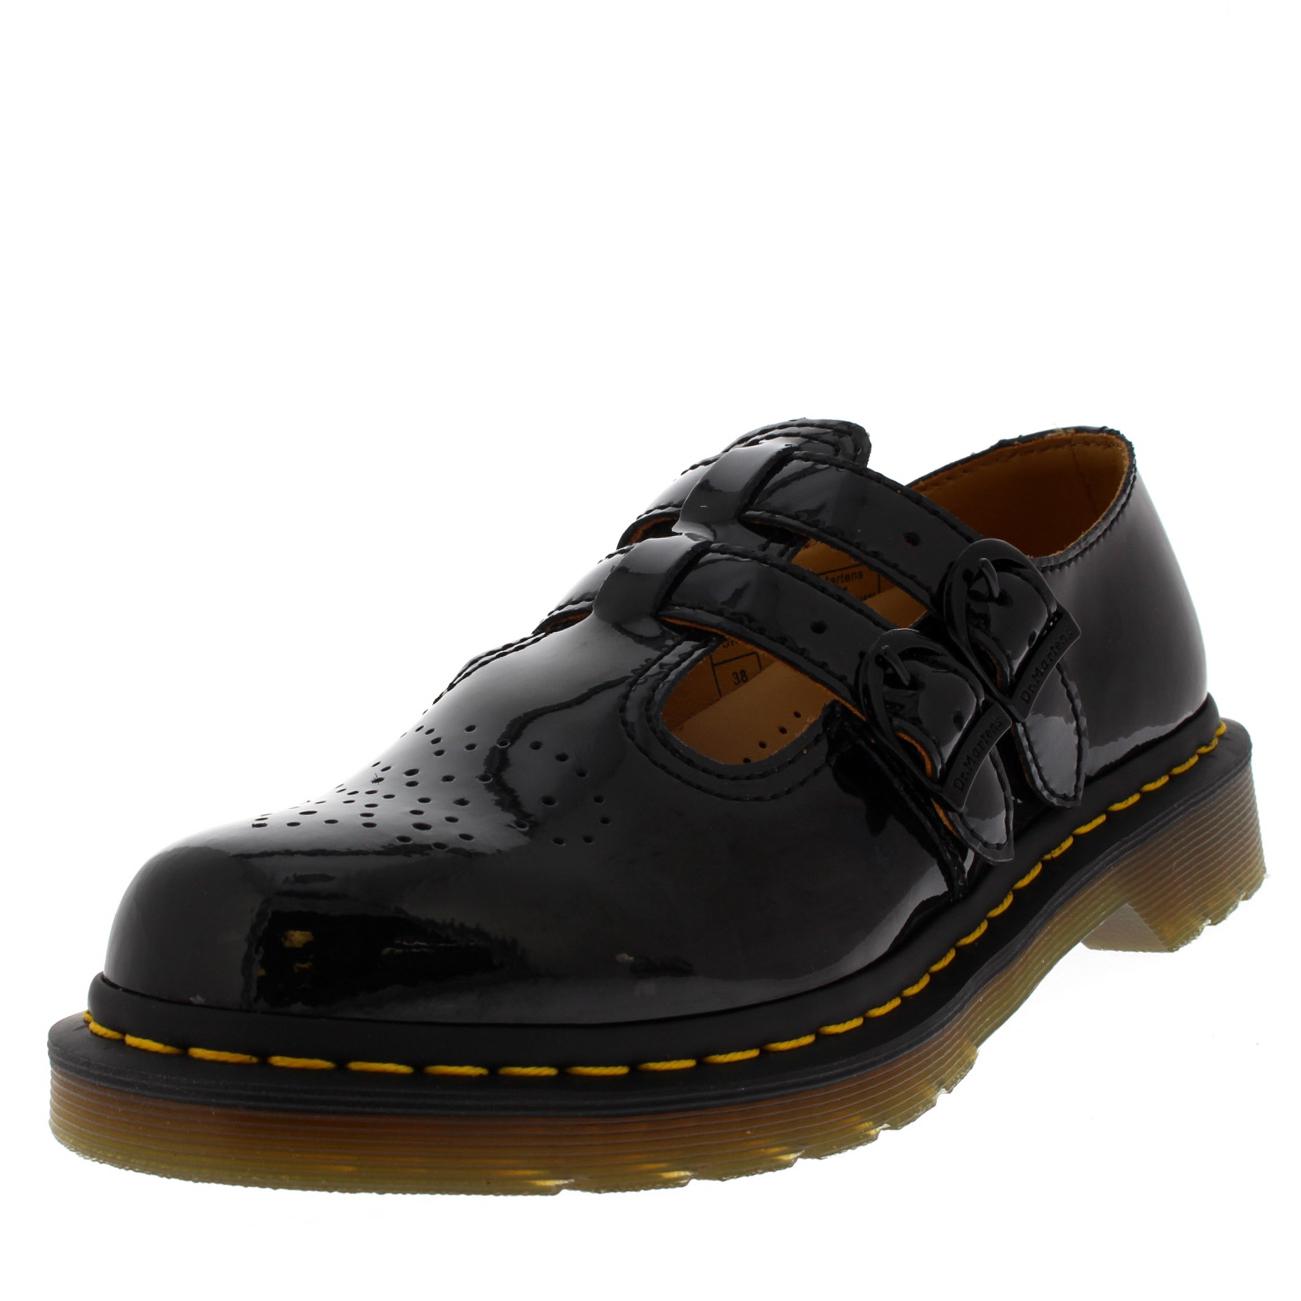 Dr.Martens Womens 8065 Mary Jane Leather Shoes, Black, 43 EU